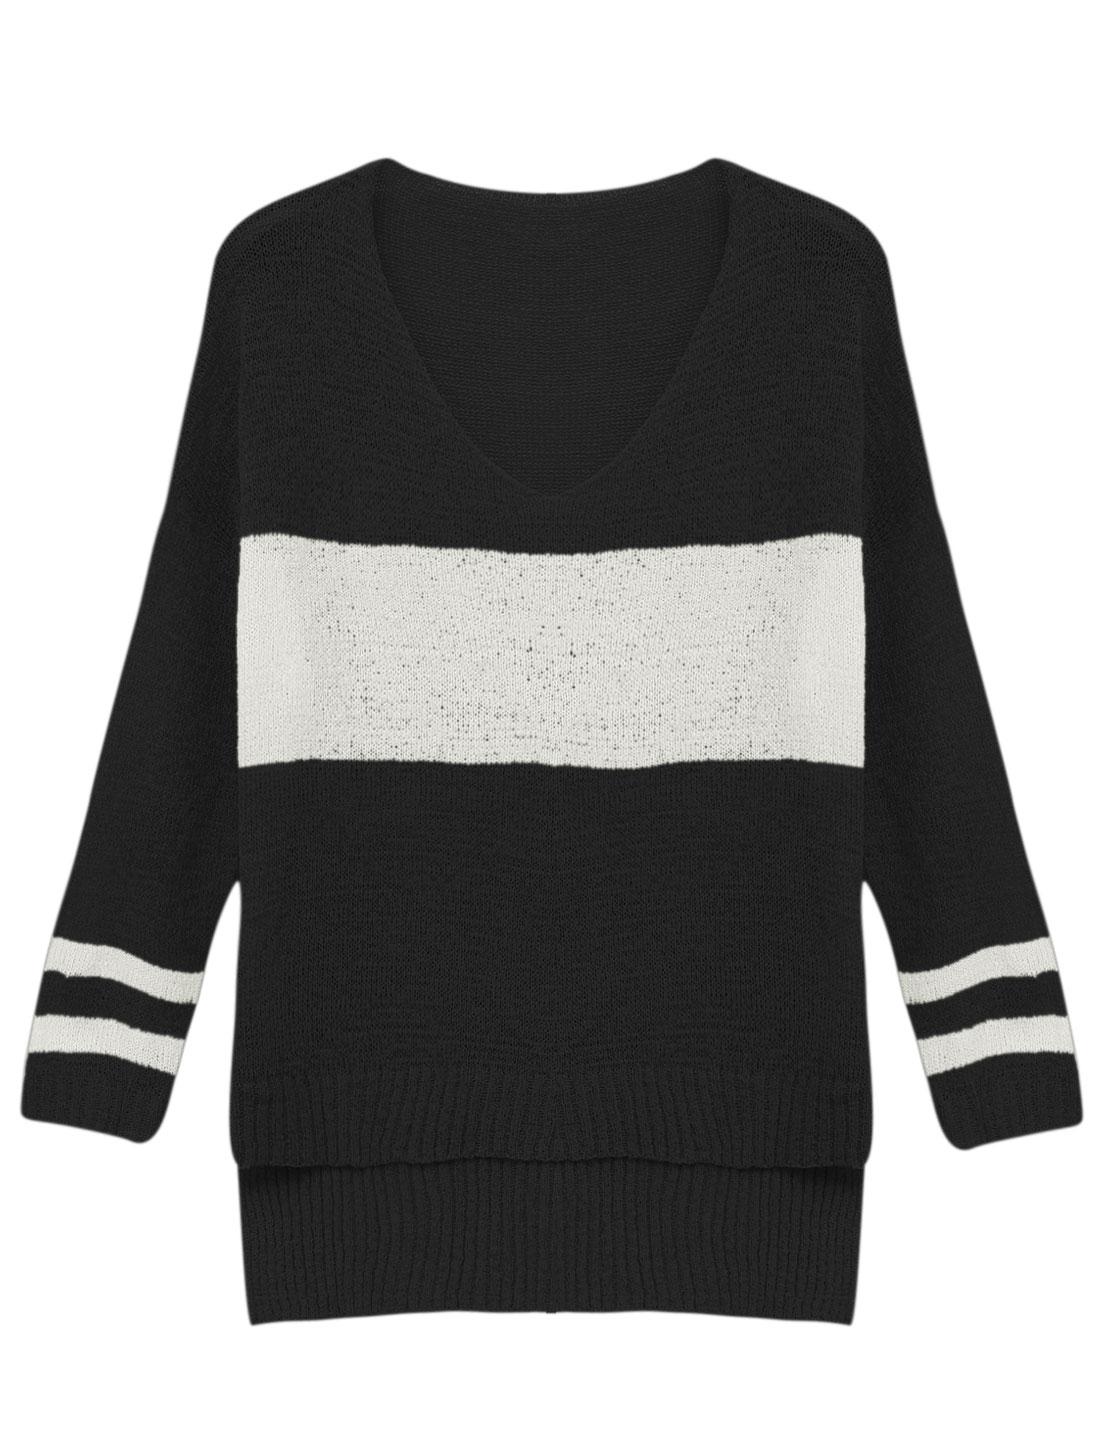 Woman Stripes V Neck 3/4 Sleeves High Low Hem Tunic Knit Top Black S